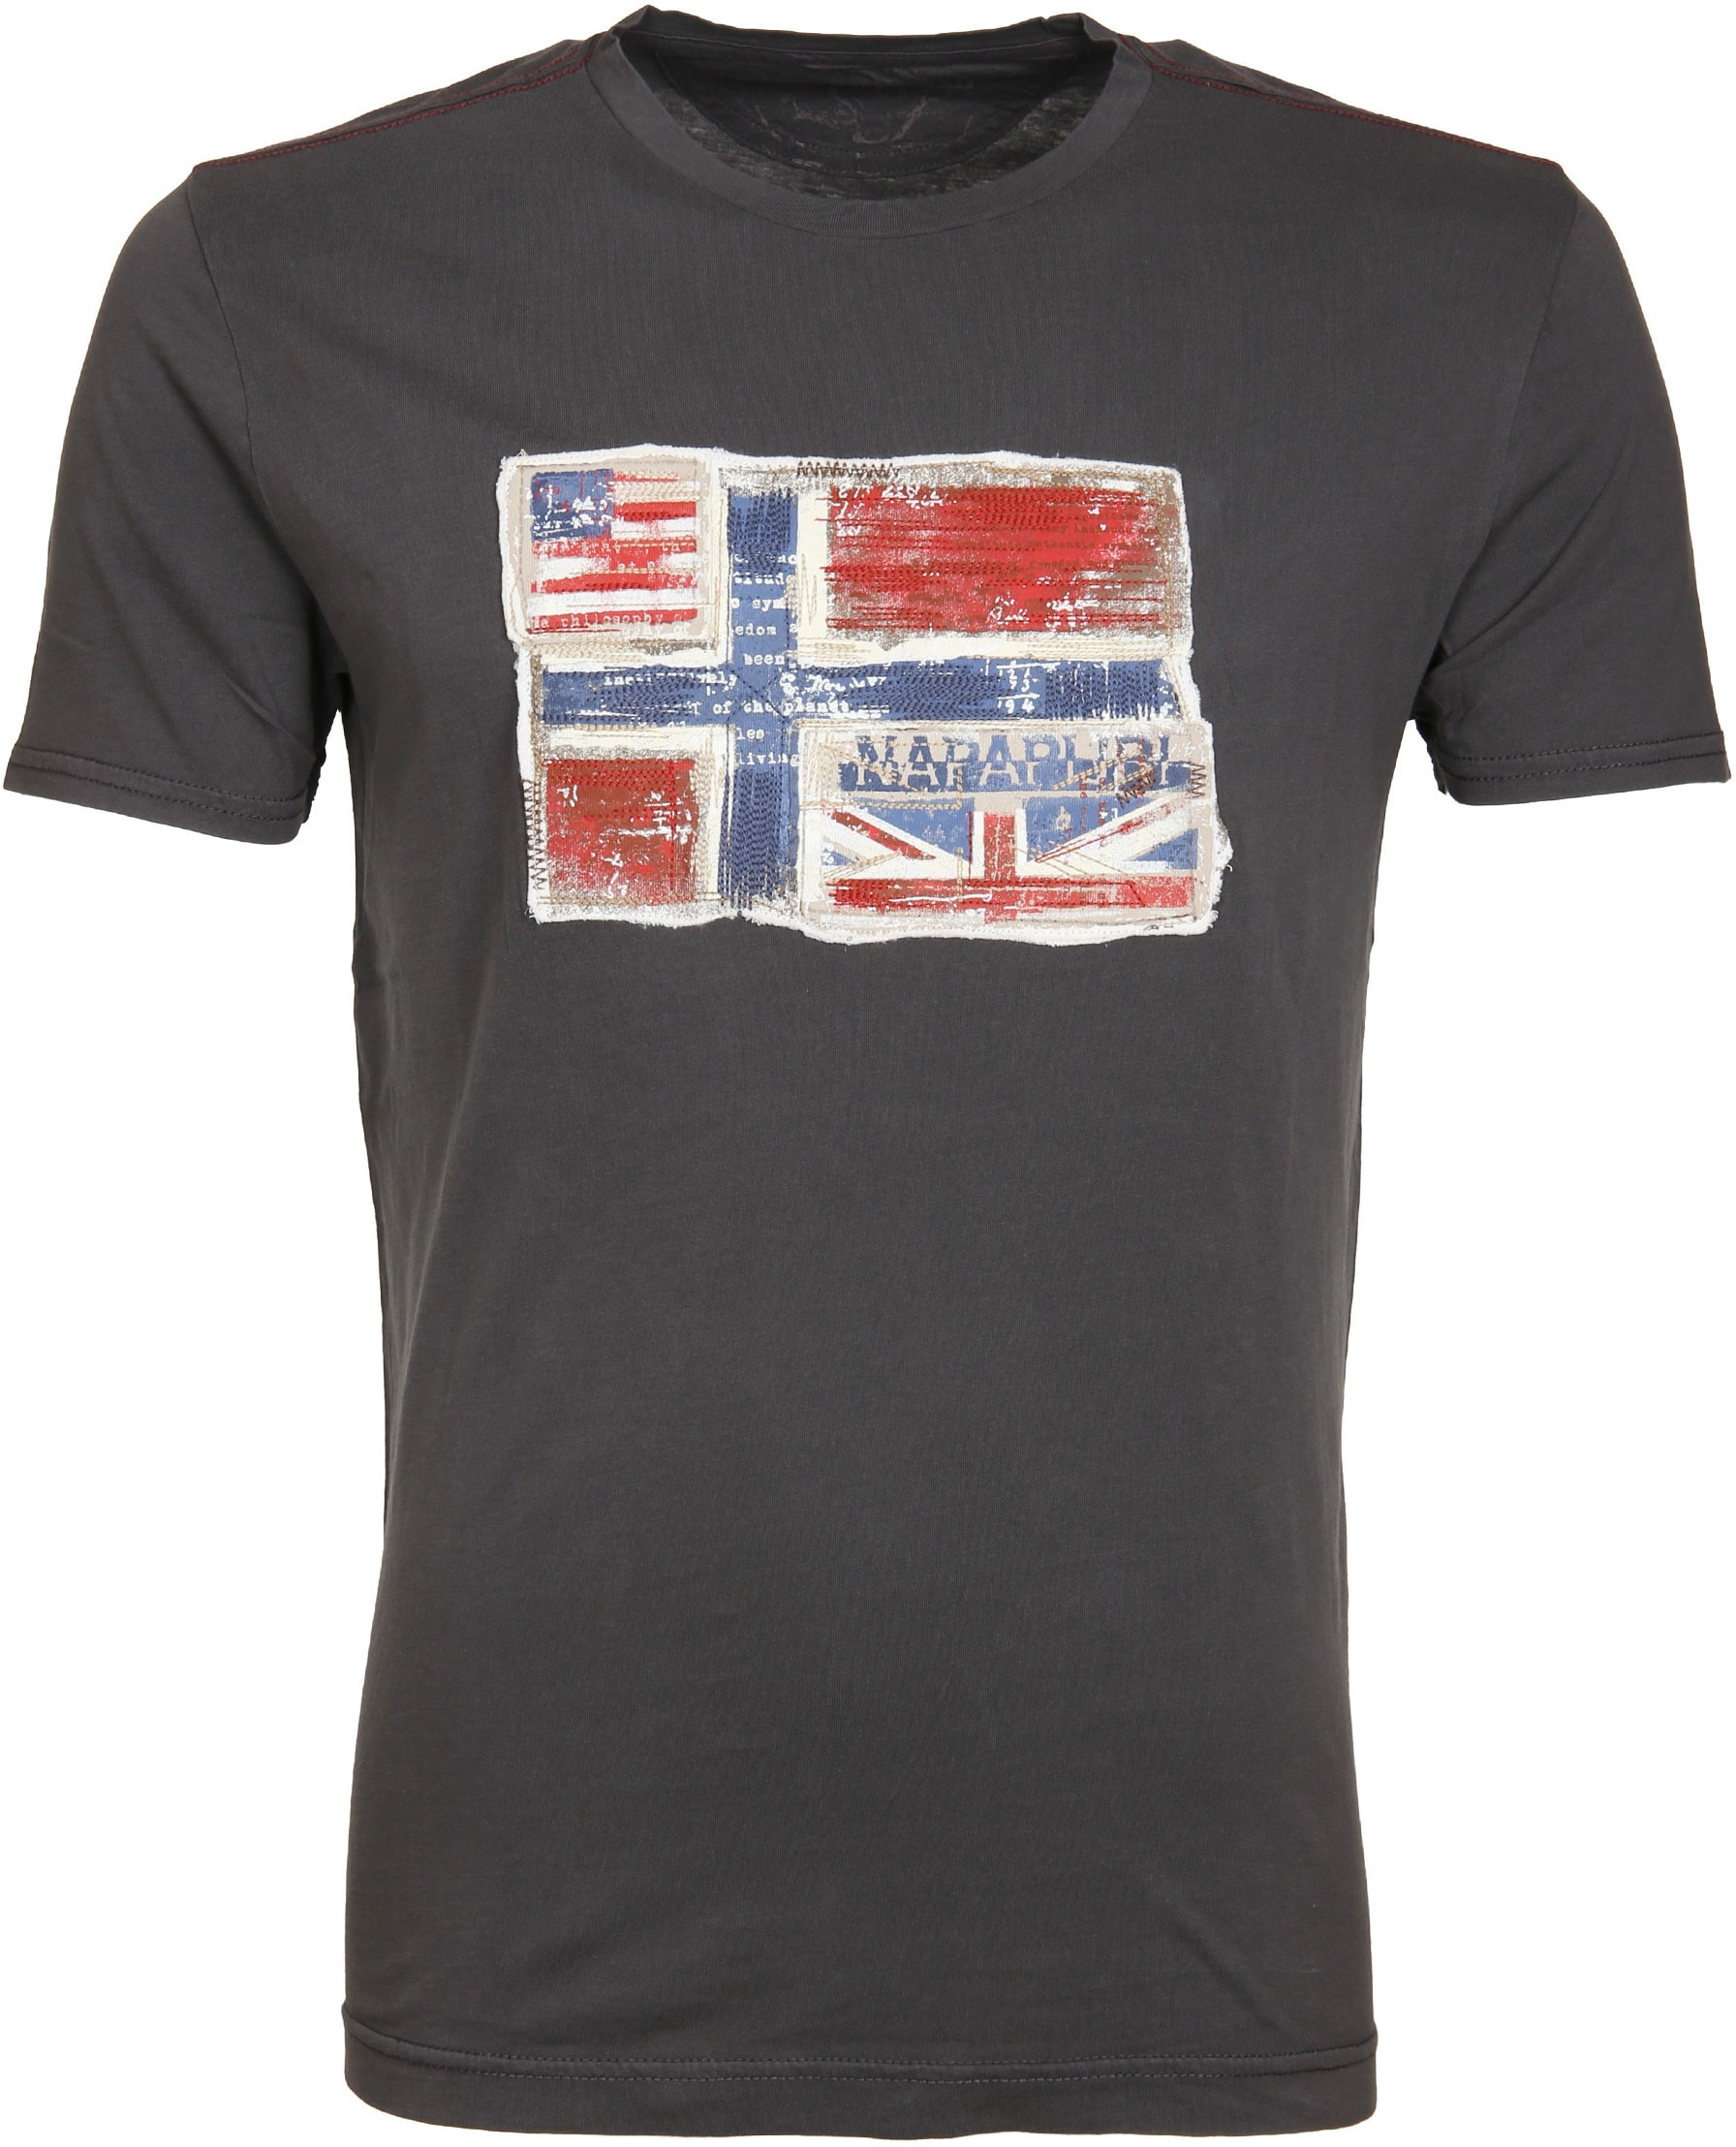 Napapijri T-shirt Senou Flag Dunkelgrau foto 0